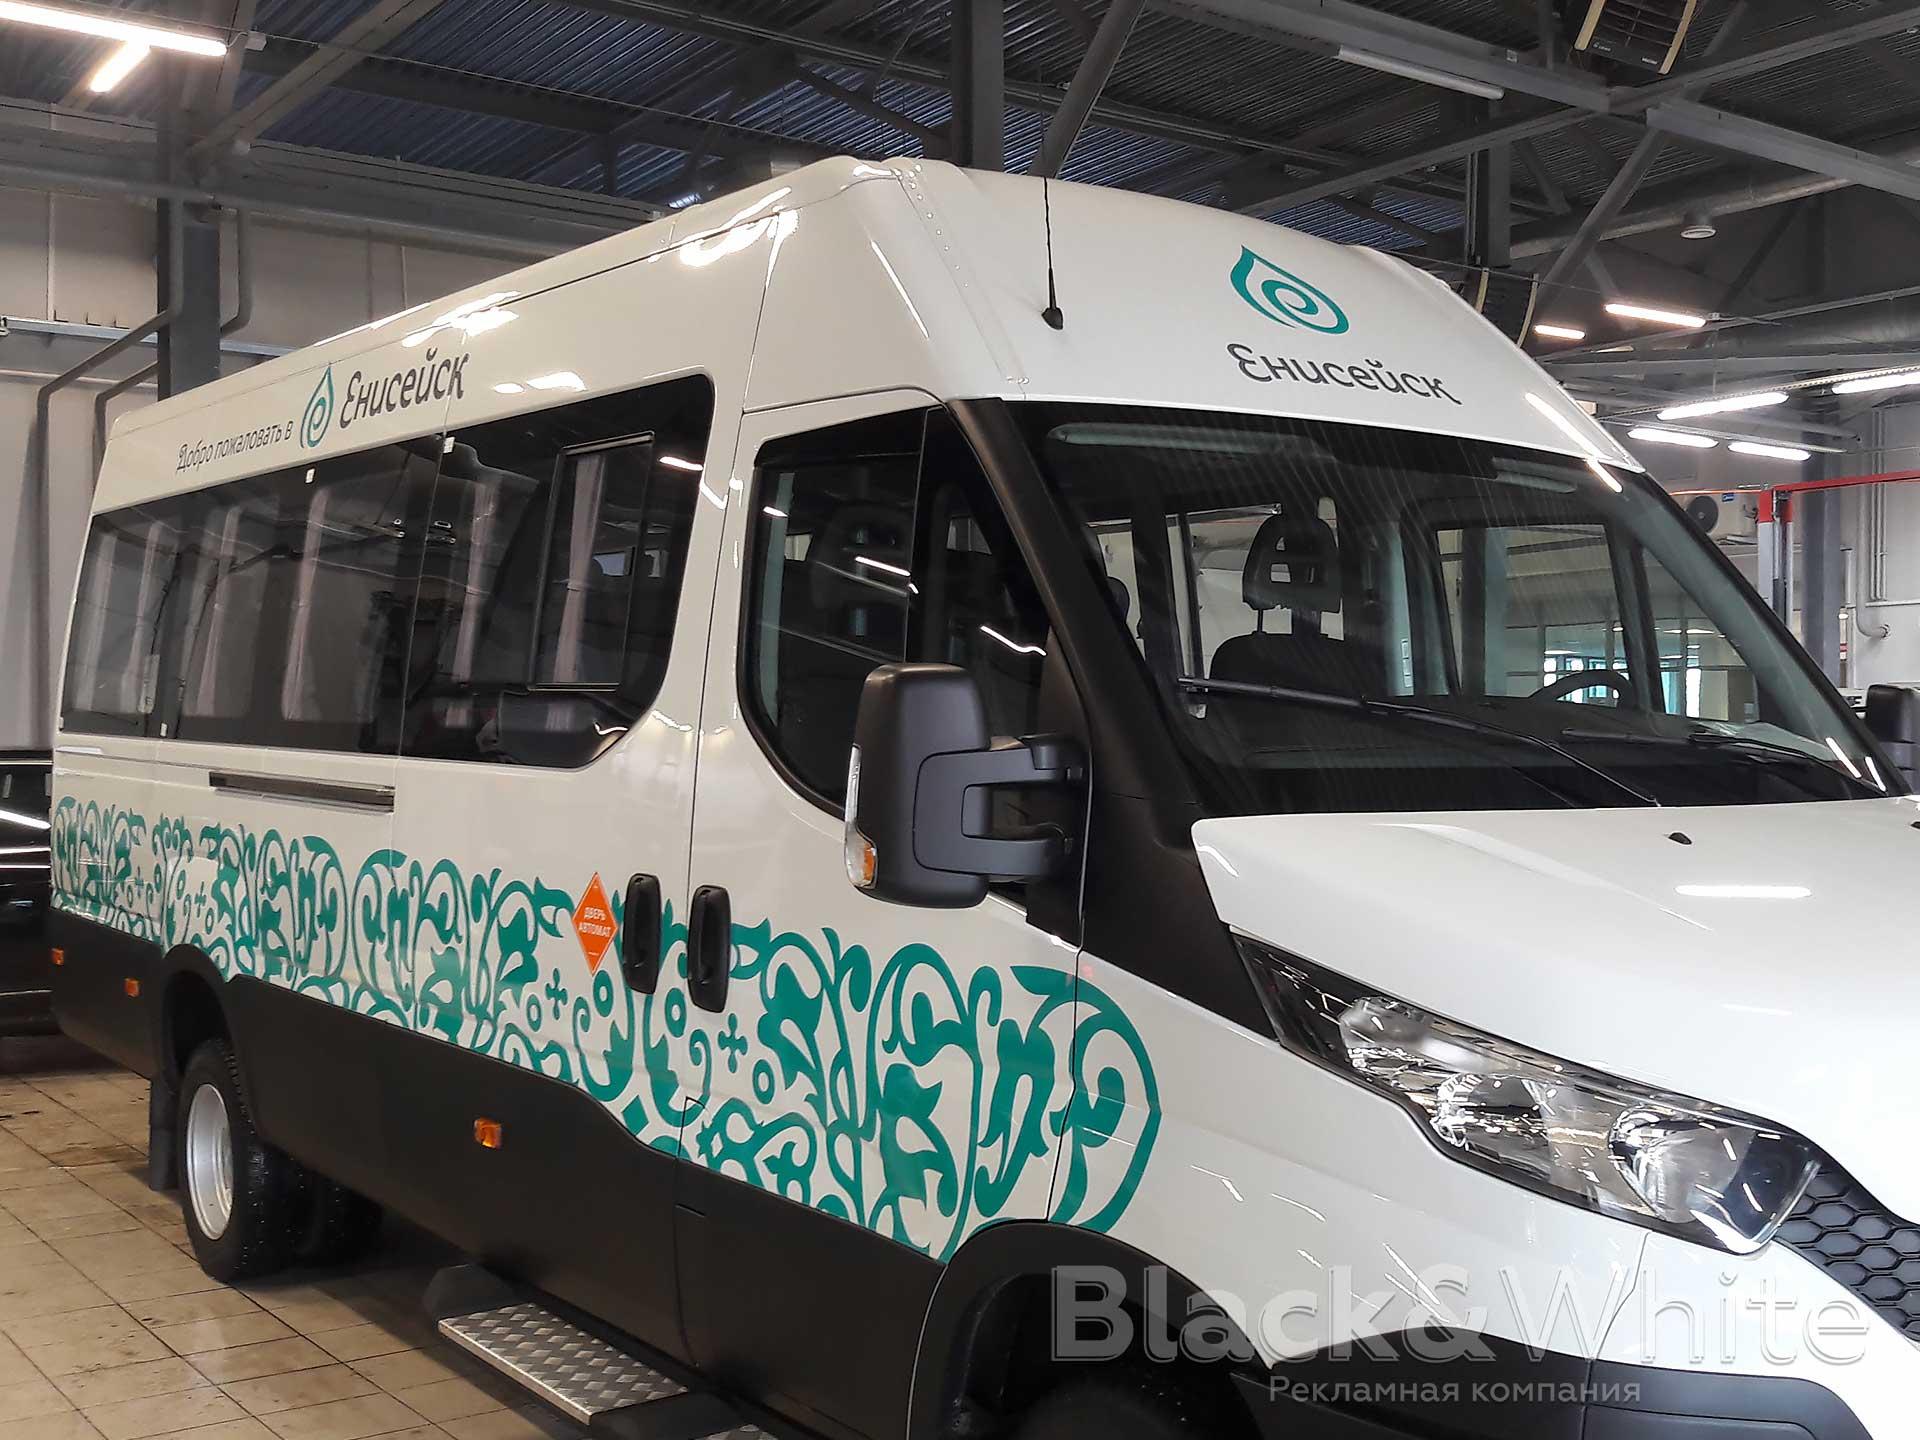 Брендирование-автобусов-Black&White-реклама-на-пассажирских-автобусах-в-Красноярске-bw.jpg